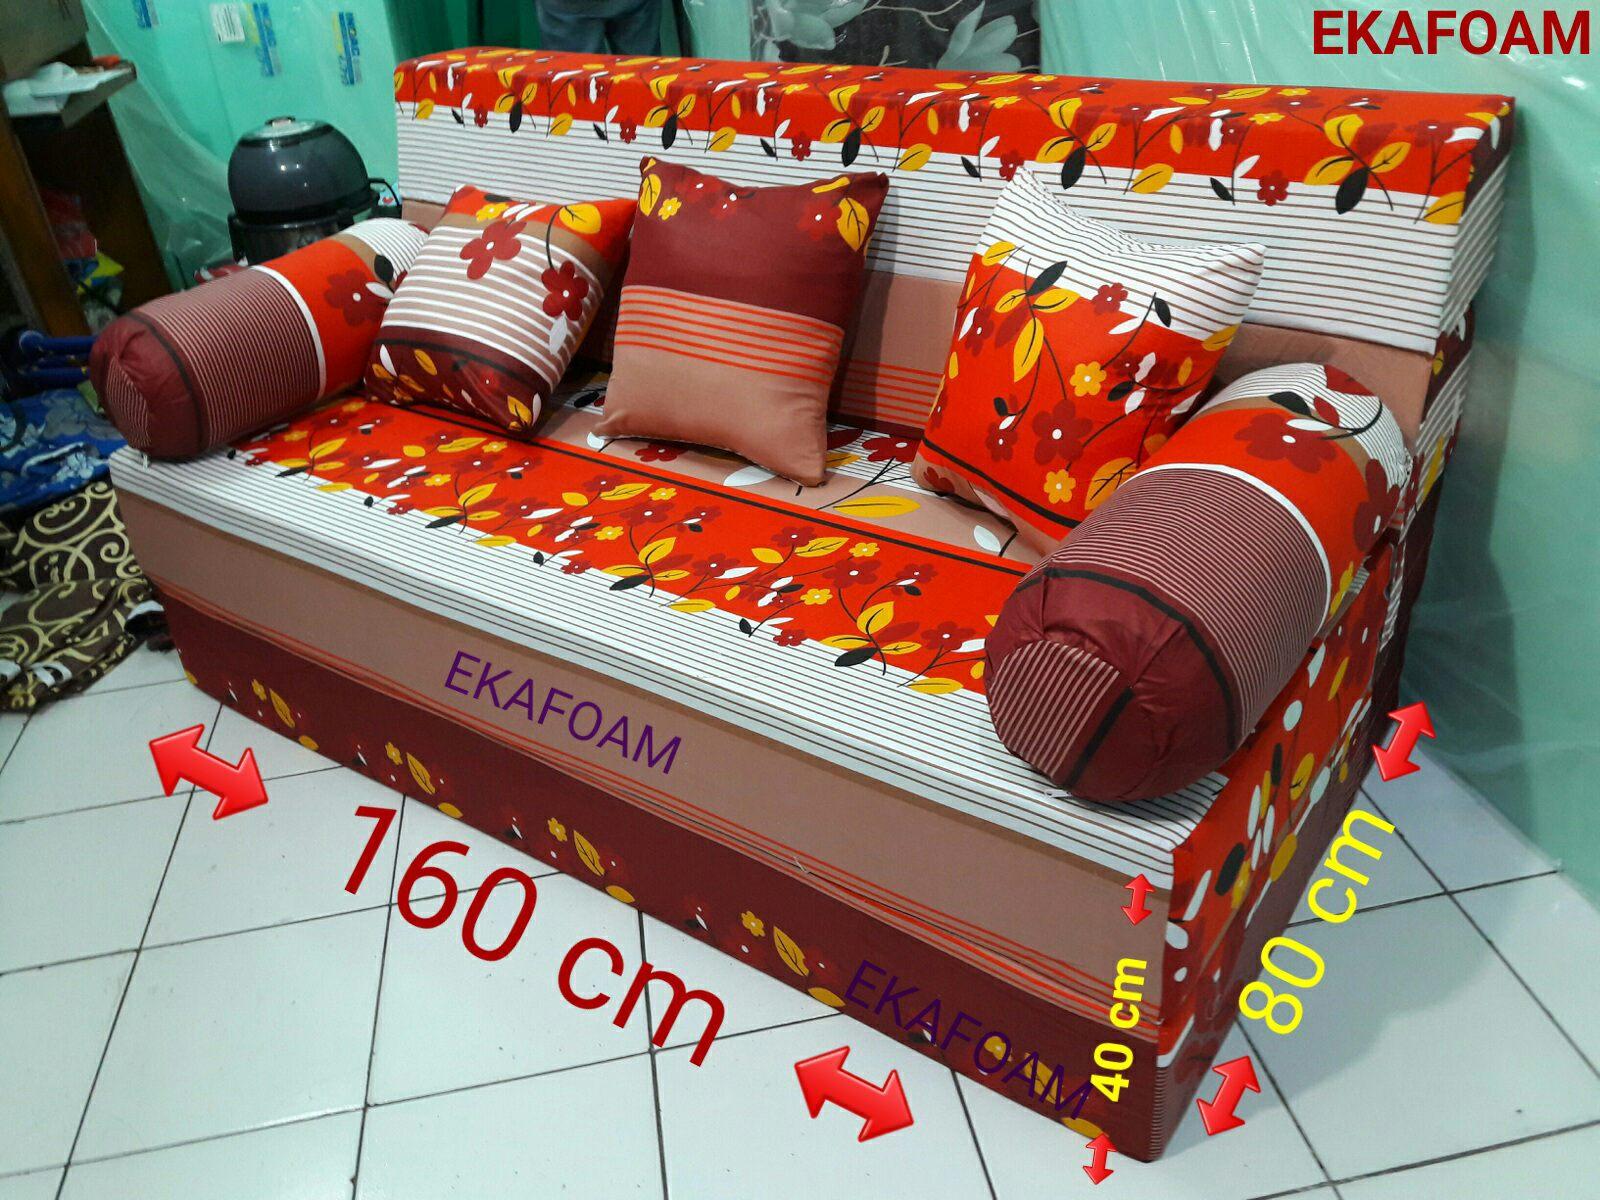 harga sofa bed inoac no 1 craigslist sacramento sectional kasur terbaru mei 2018 agen busa